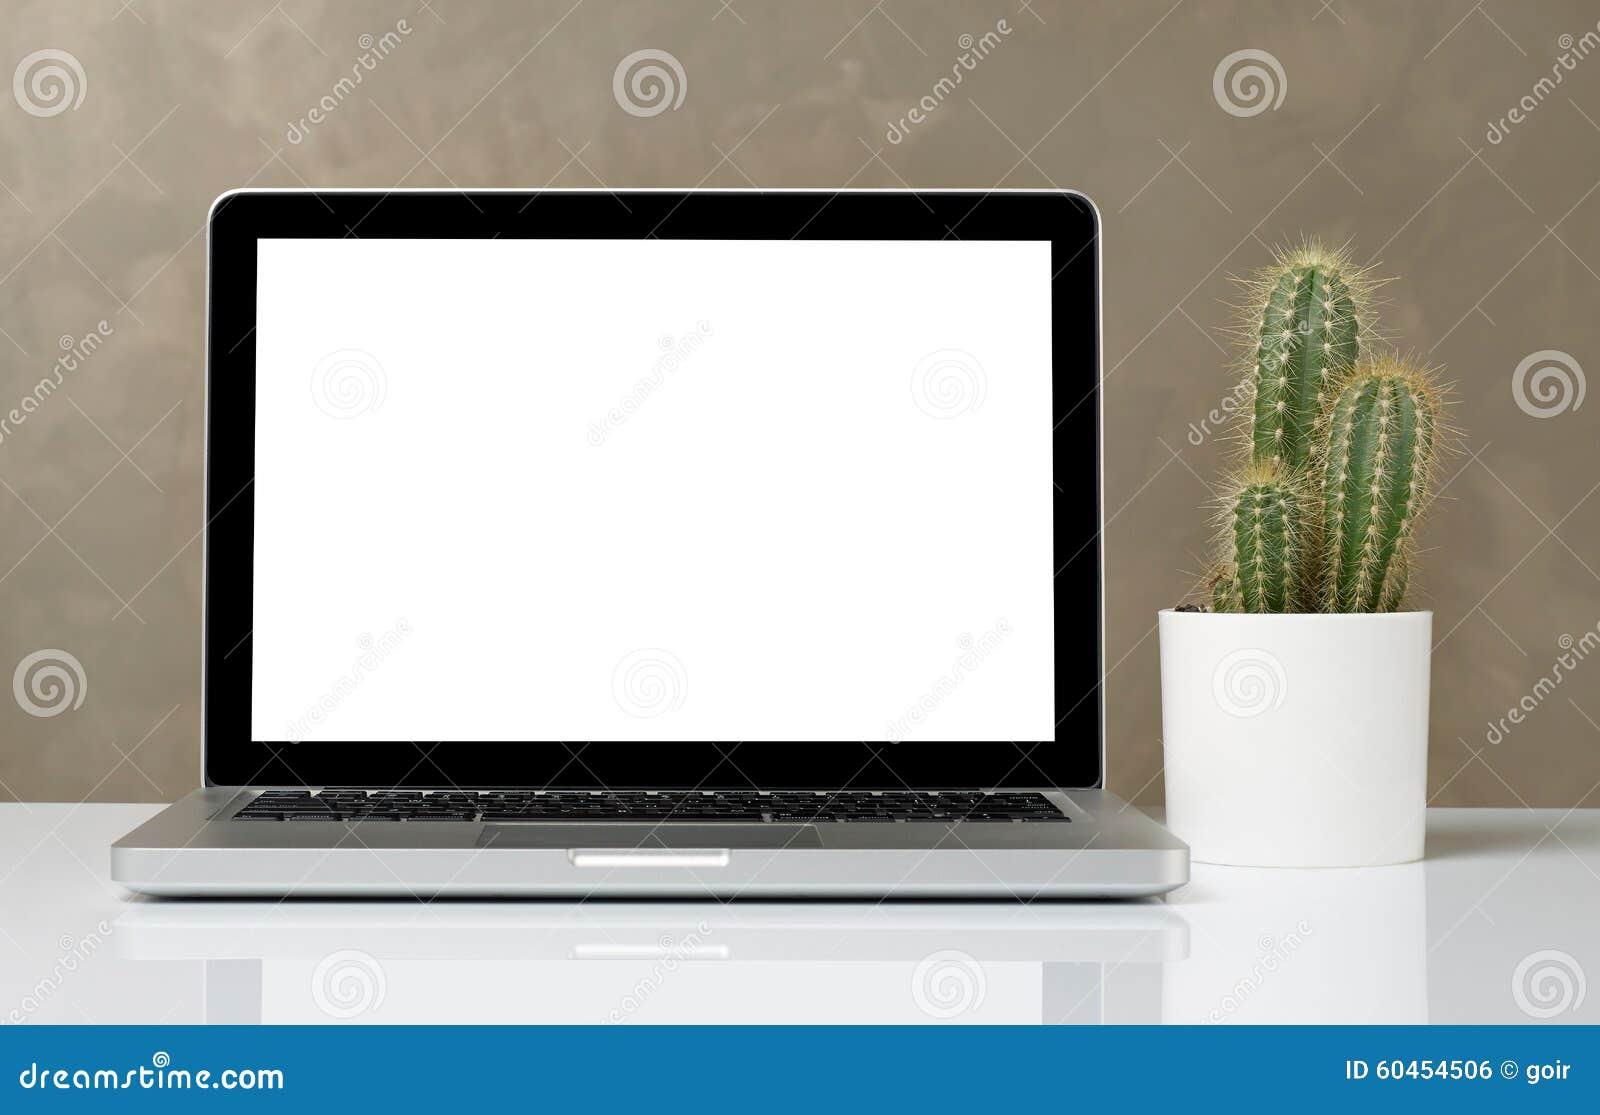 Computer portatile e cactus